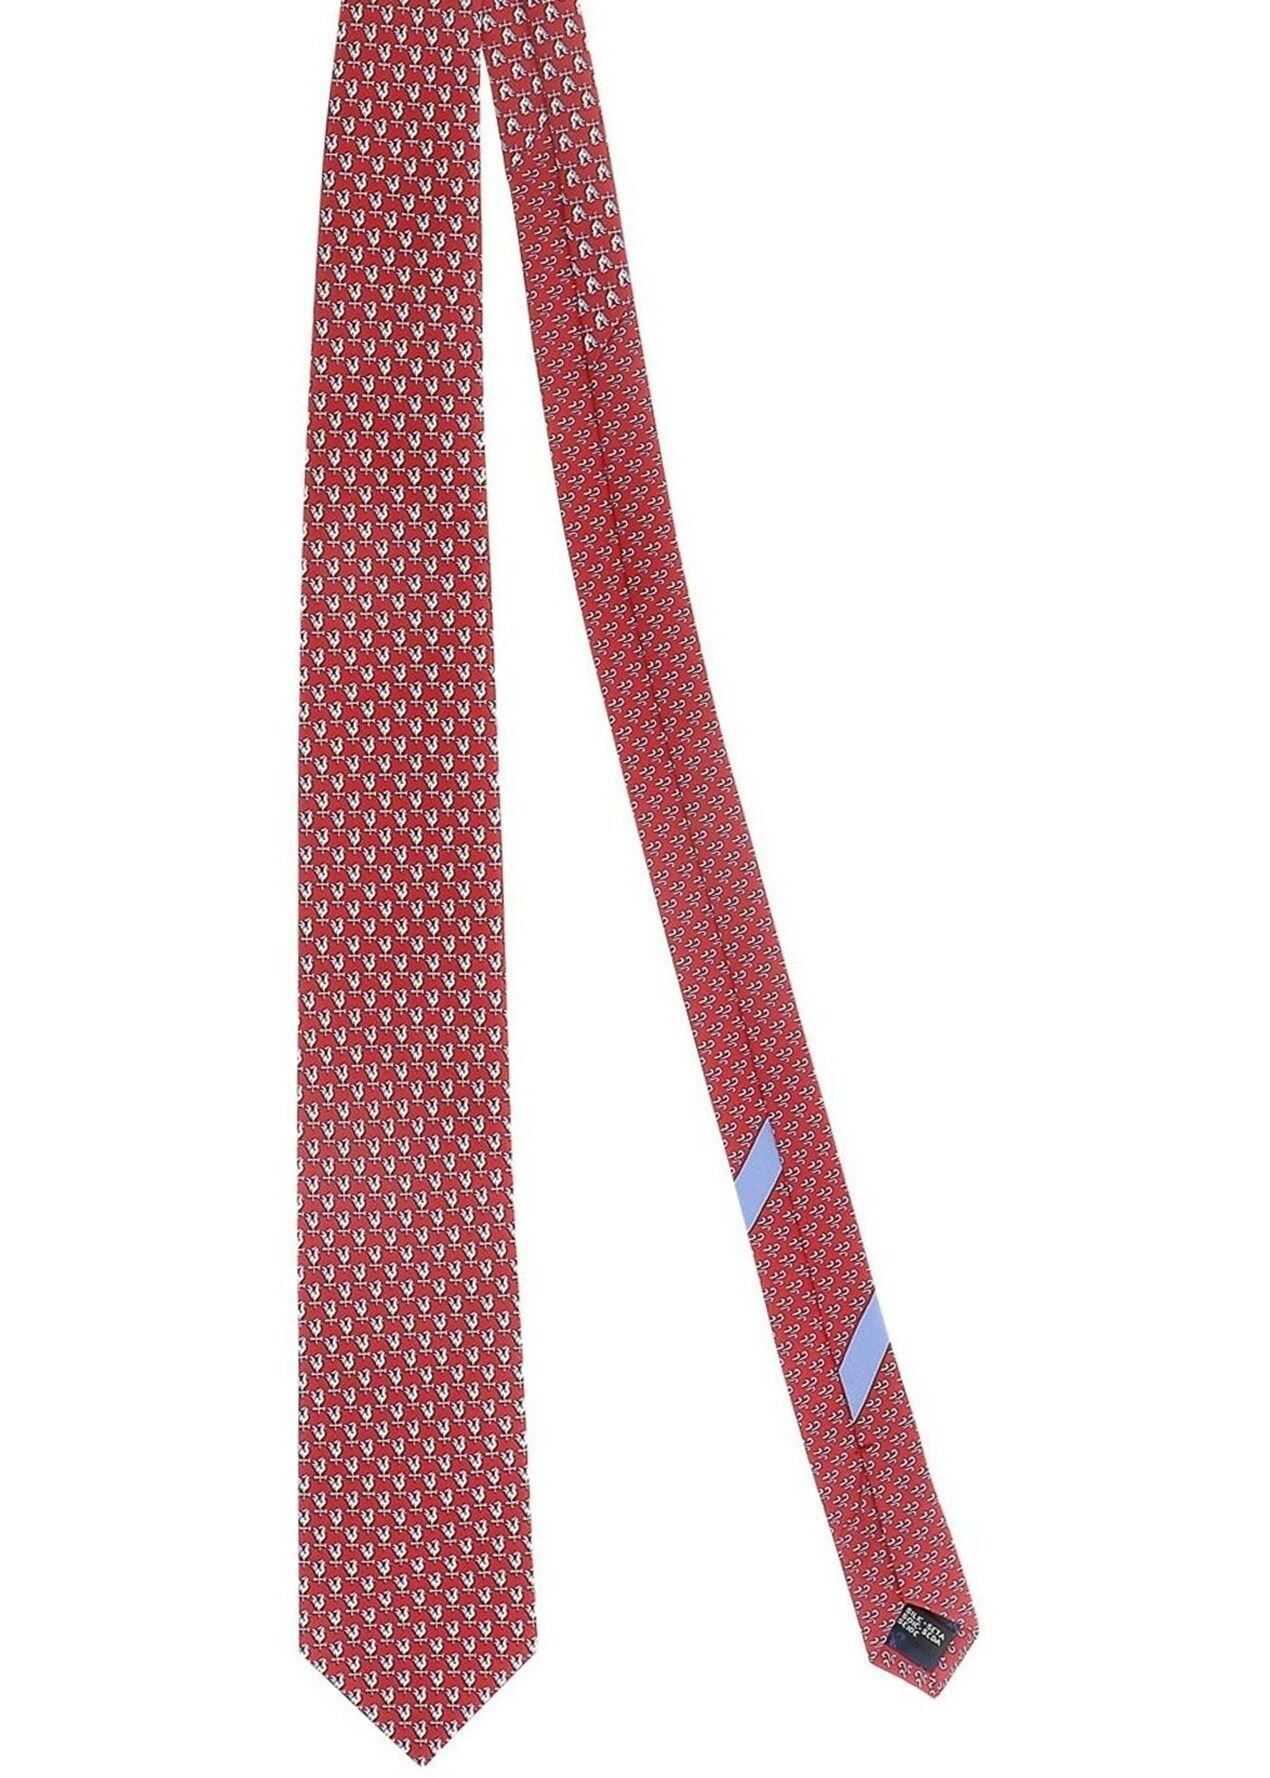 Salvatore Ferragamo Chickens Patterned Tie In Red Red